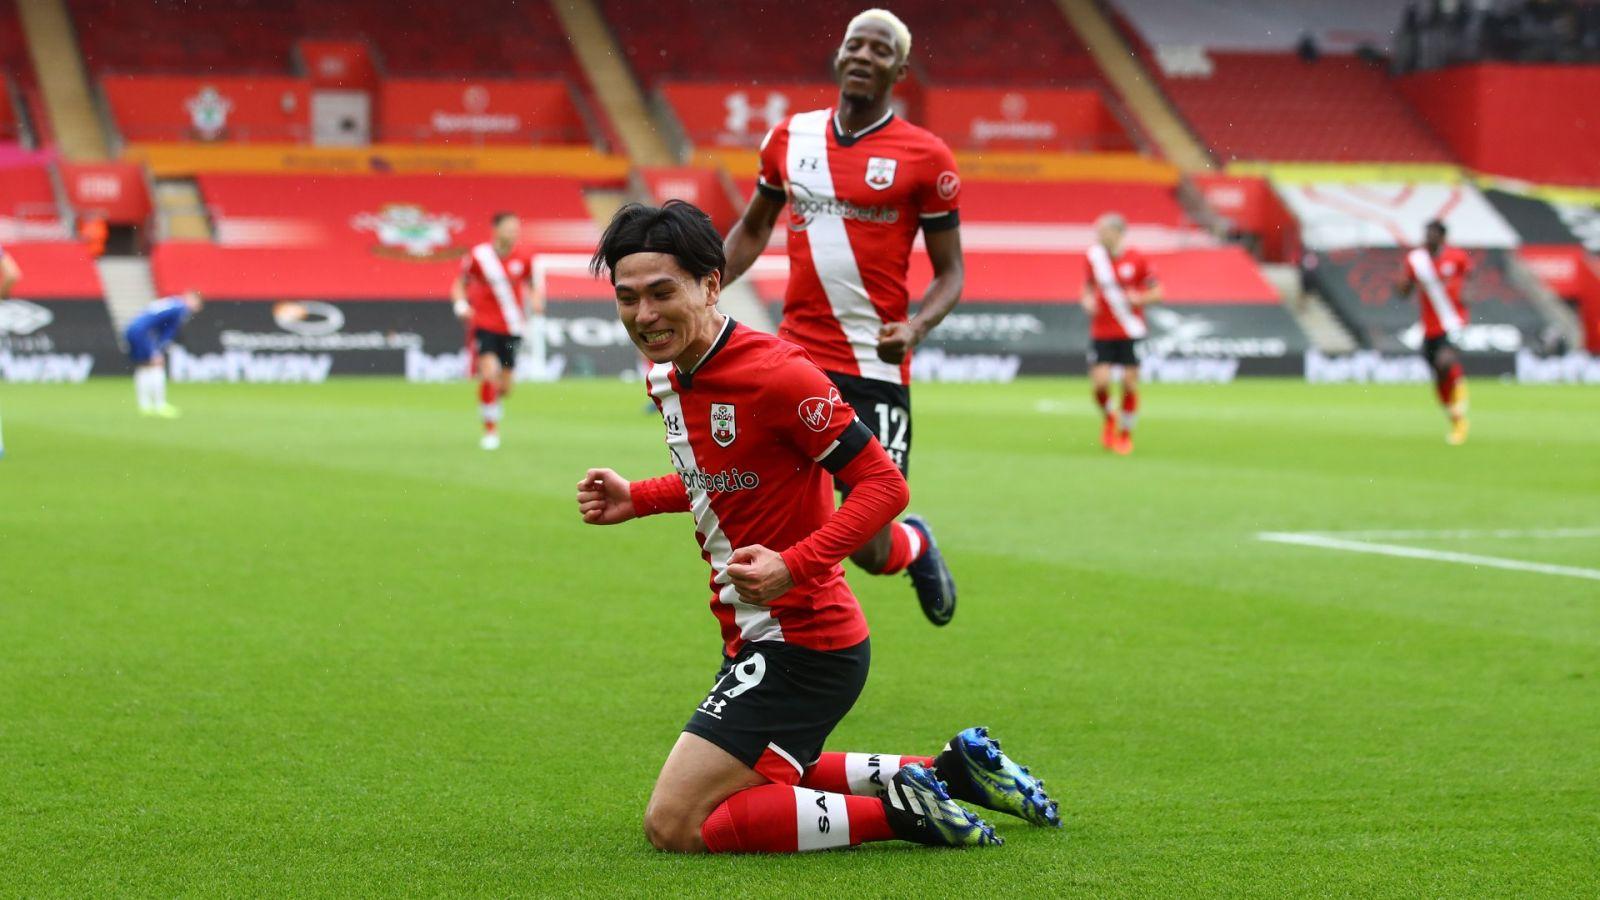 Takumi Minamino selebrasi dalam pertandingan Southampton vs Chelsea. (foto: twitter.com/SouthamptonFC)